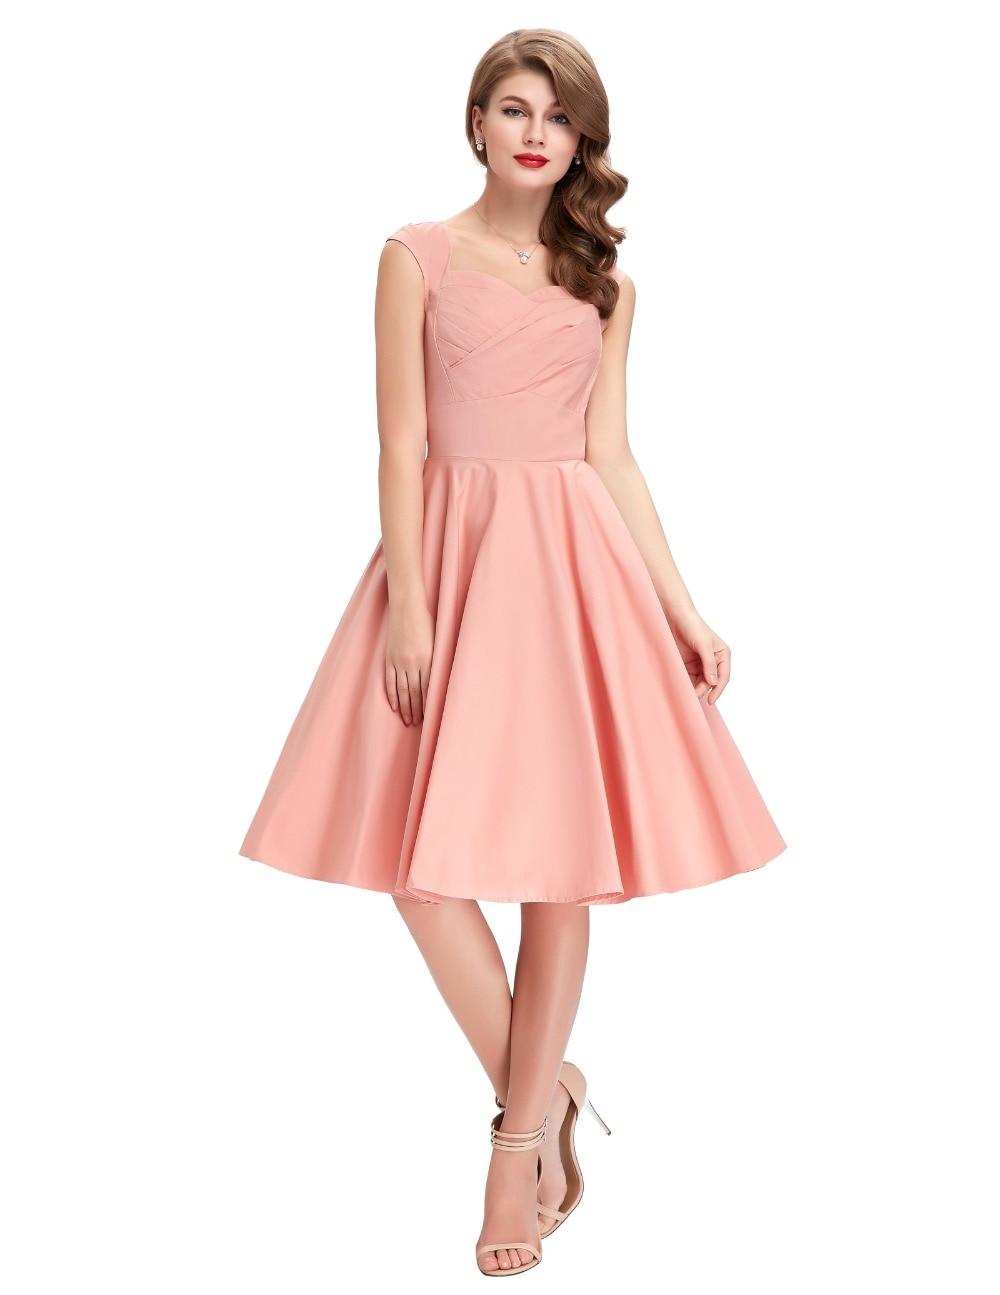 Aliexpress.com : Buy Red Pink Green Black Rockabilly Dress Casual ...